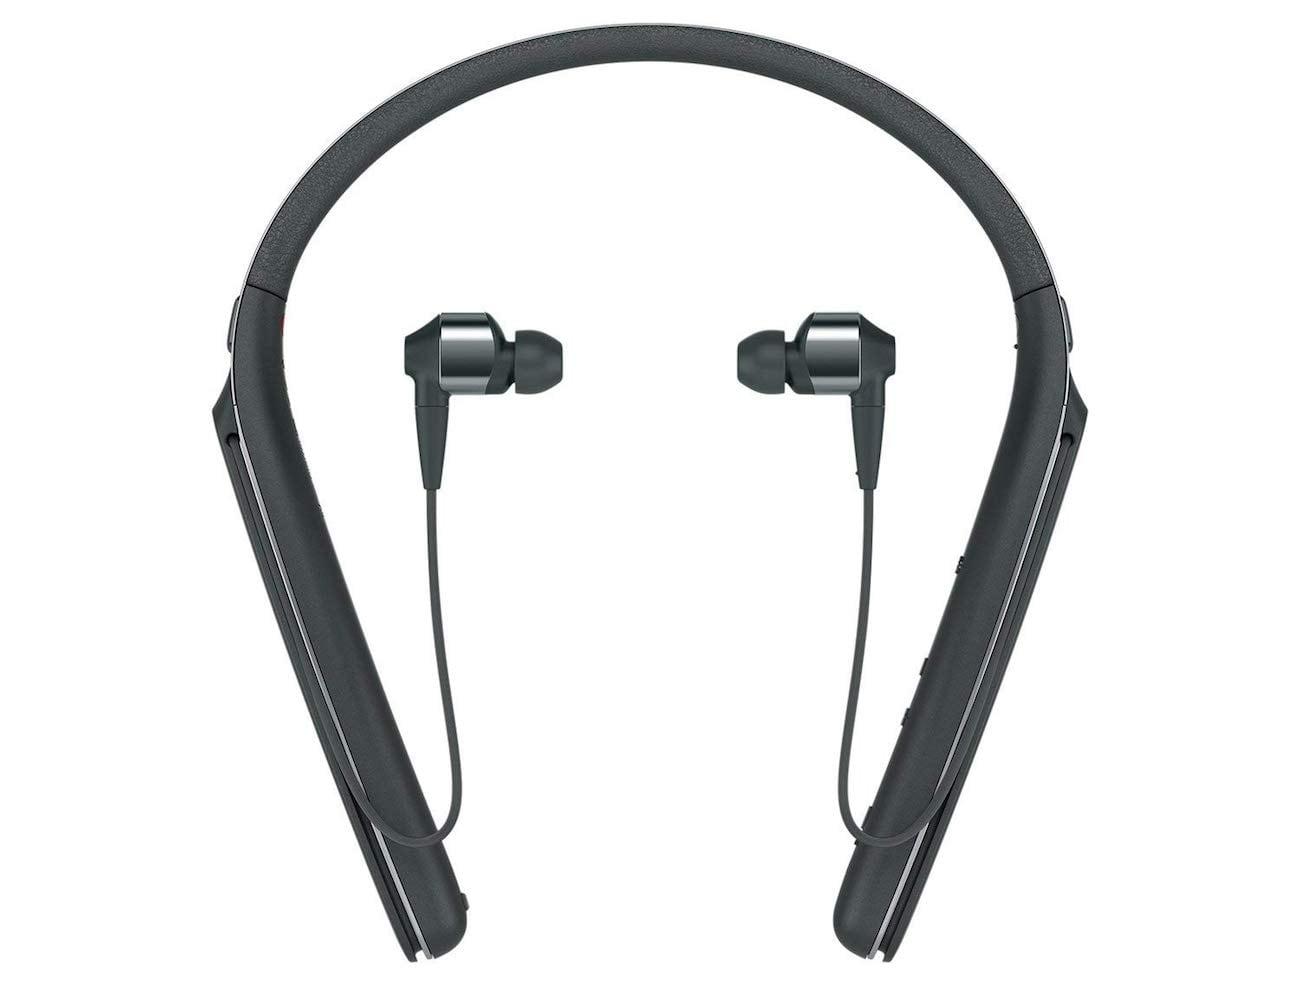 Sony WI1000X Wireless Neckband Noise Canceling Headphones